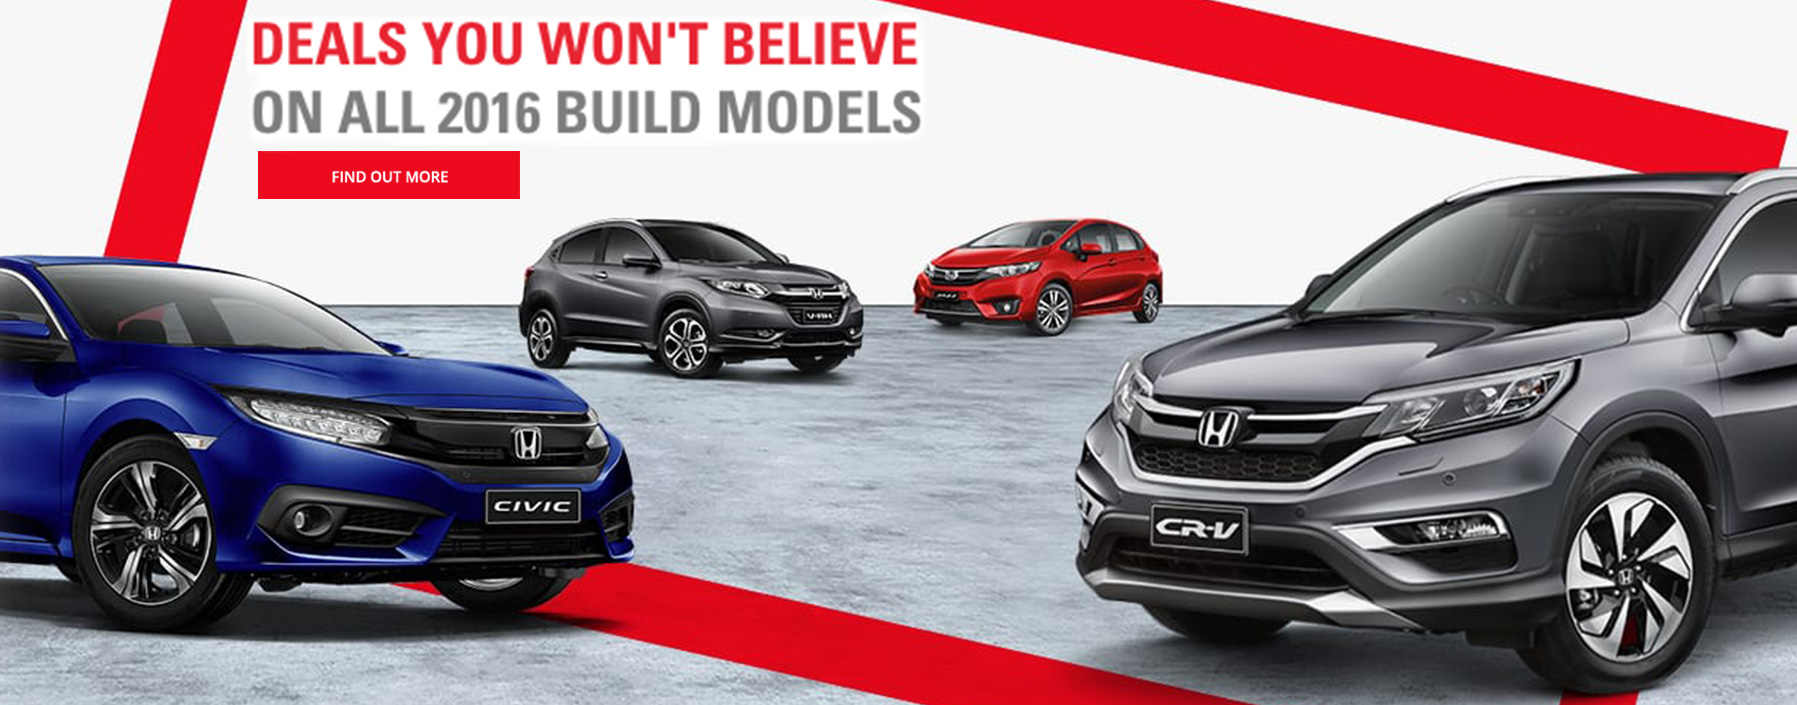 Deals you won't believe on all 2016 Build Honda's at Northside Honda Brisbane.